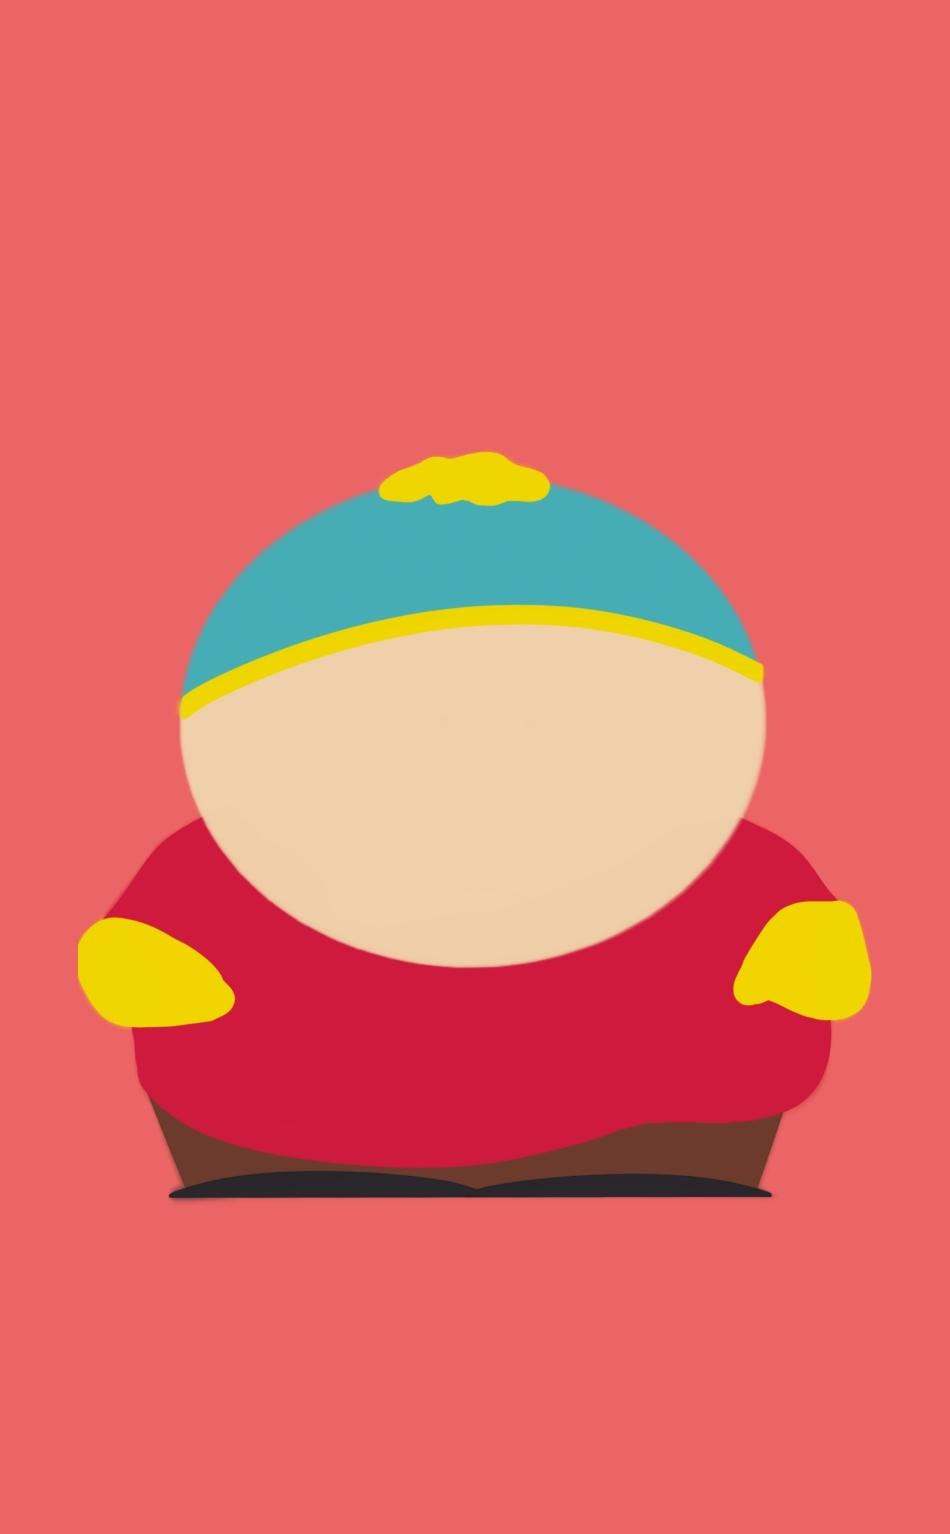 Eric Cartman South Park Minimal Hd 8k Wallpaper